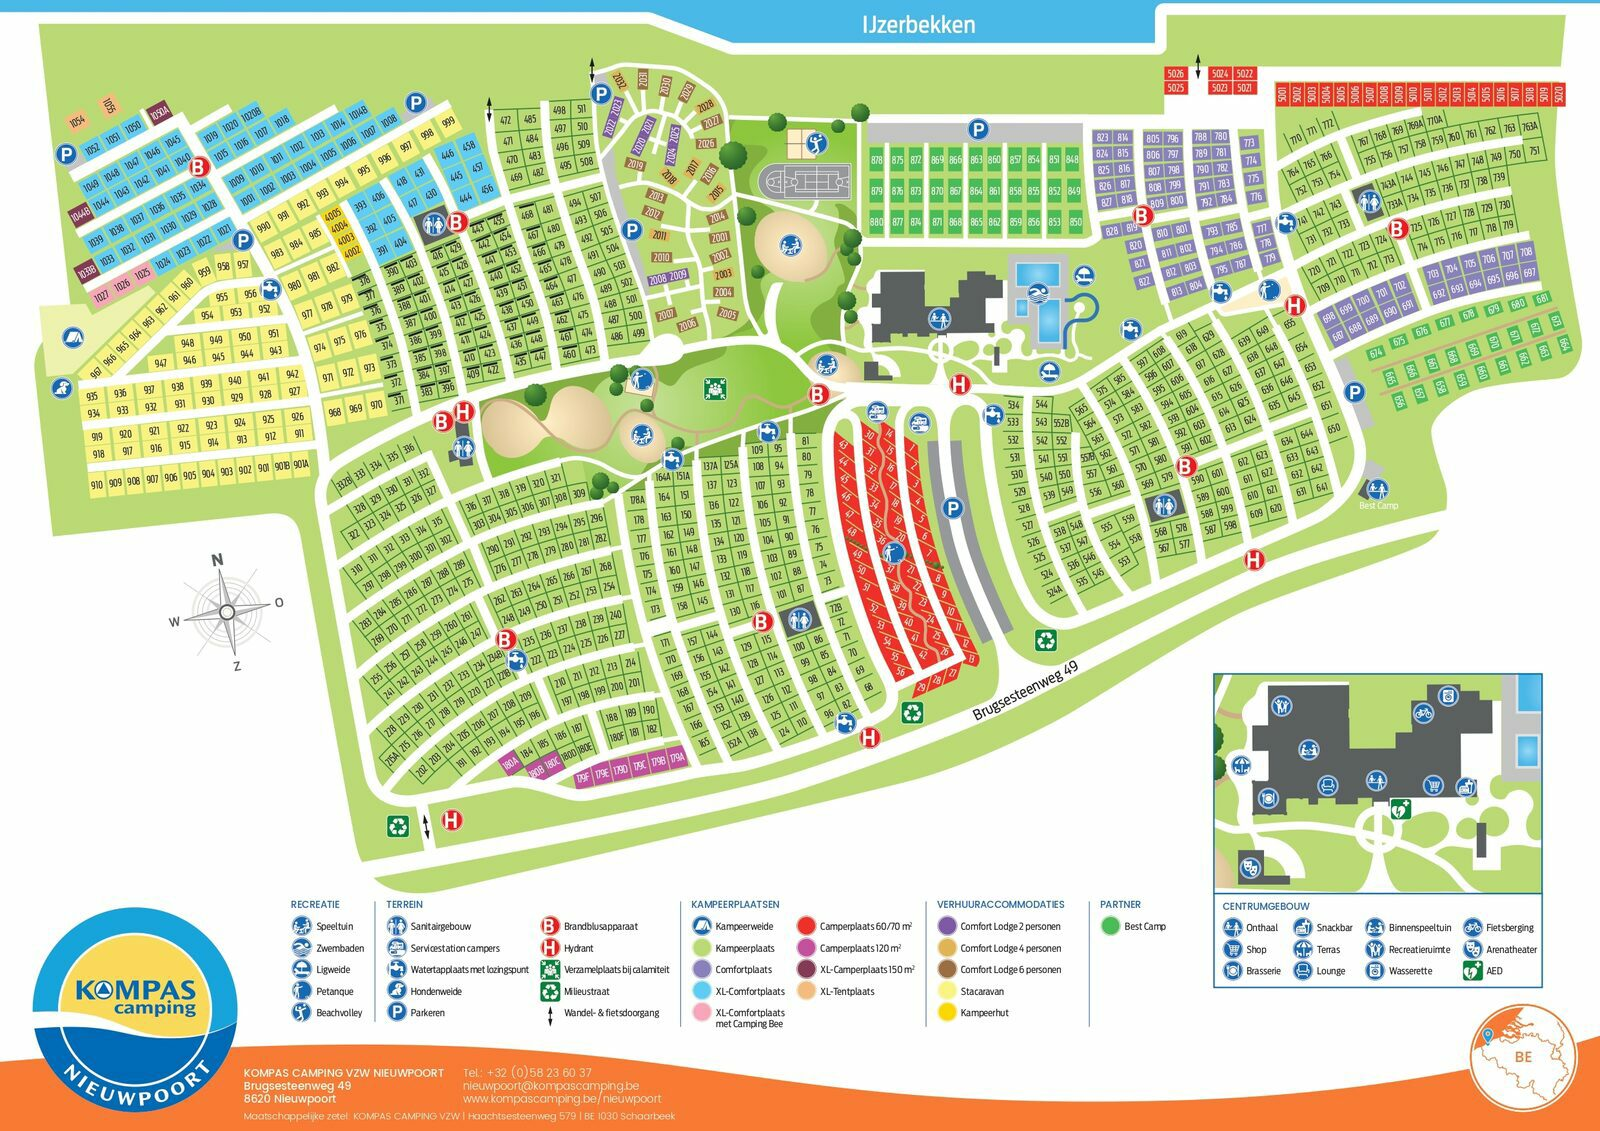 Plattegrond_Nieuwpoort_2021_79ab2ea8-54de-46e3-bba8-da3fb2c5fabe.jpg